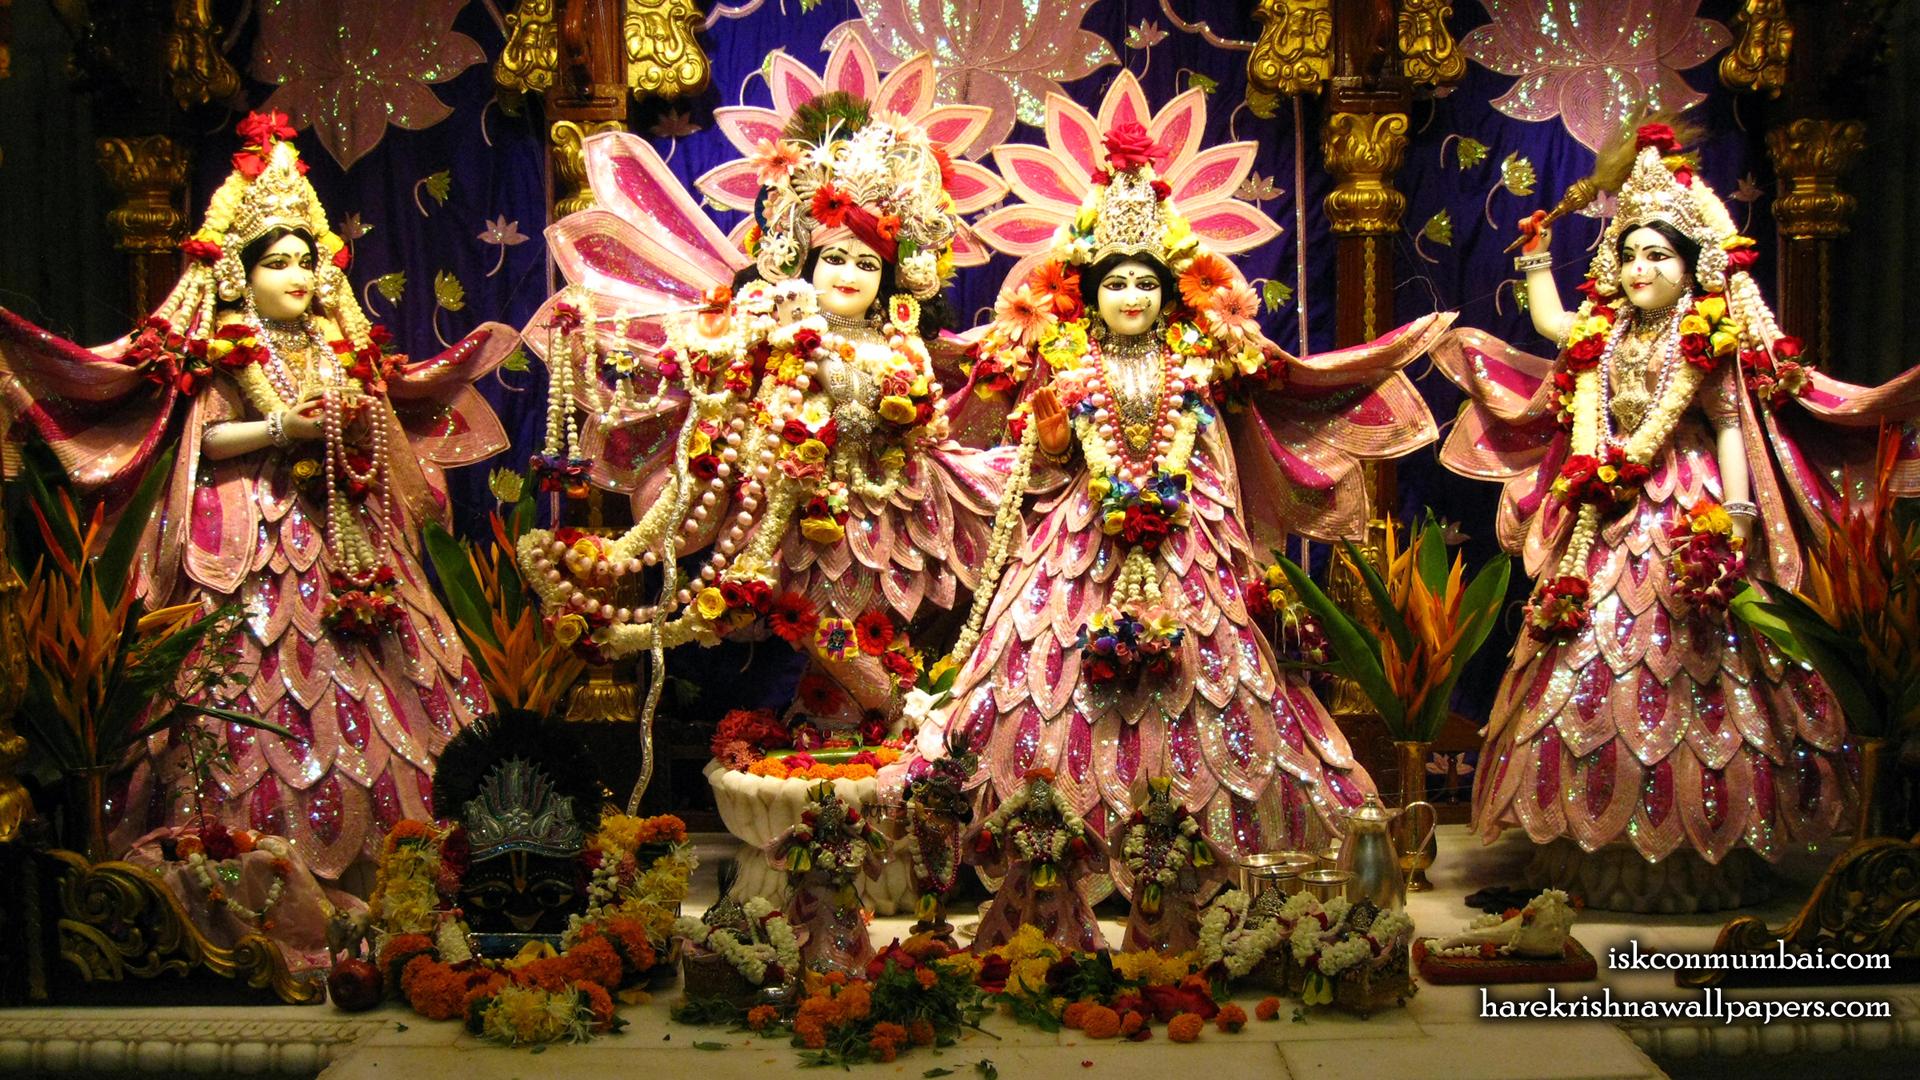 Sri Sri Radha Rasabihari Lalita Vishakha Wallpaper (006) Size 1920x1080 Download